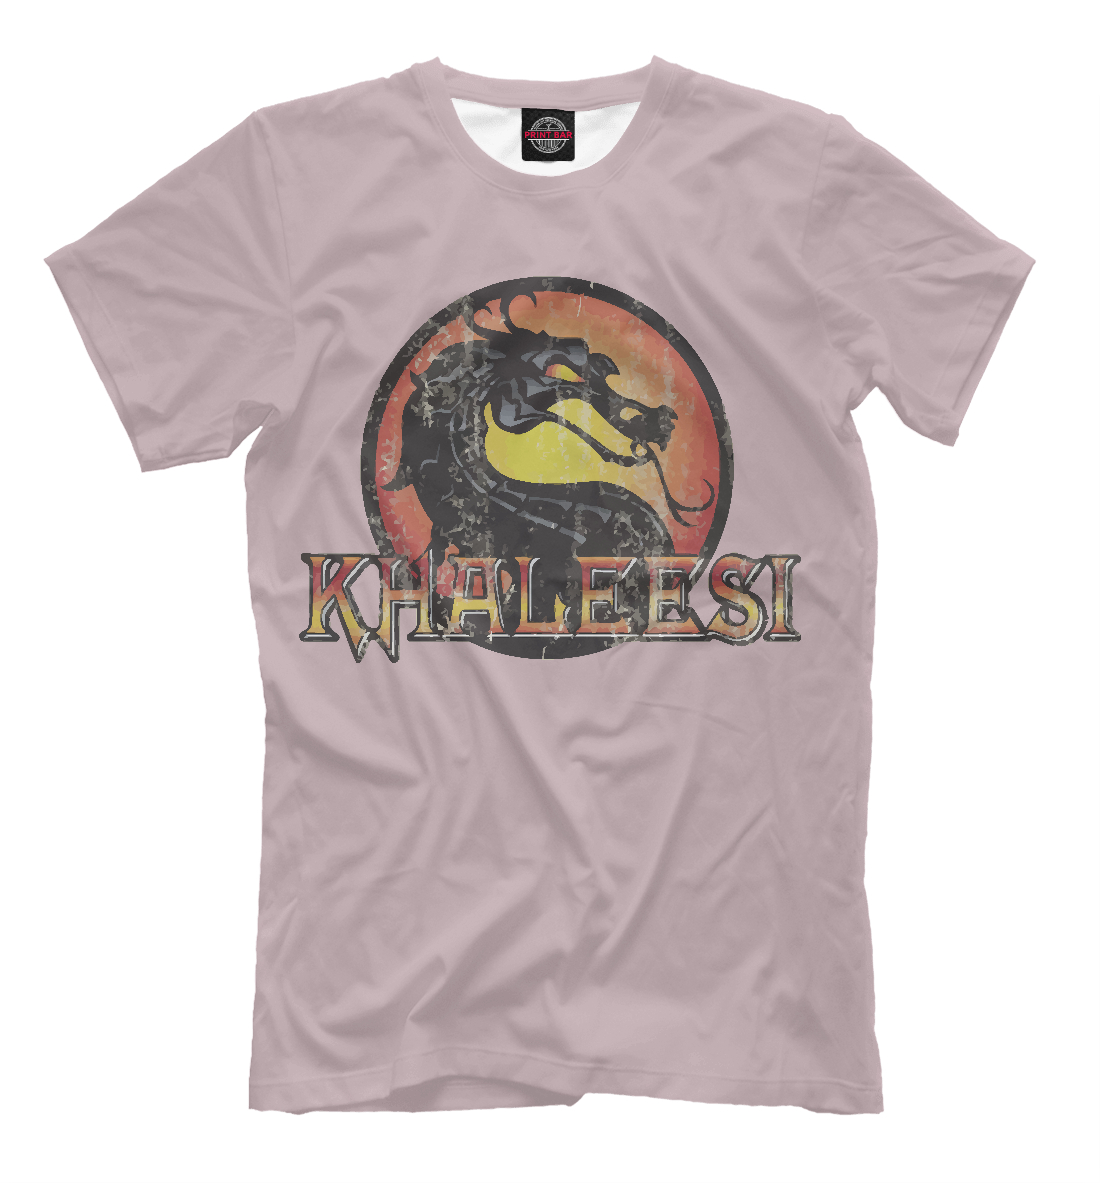 Купить Khaleesi - Mortal Kombat, Printbar, Футболки, IGR-543081-fut-2